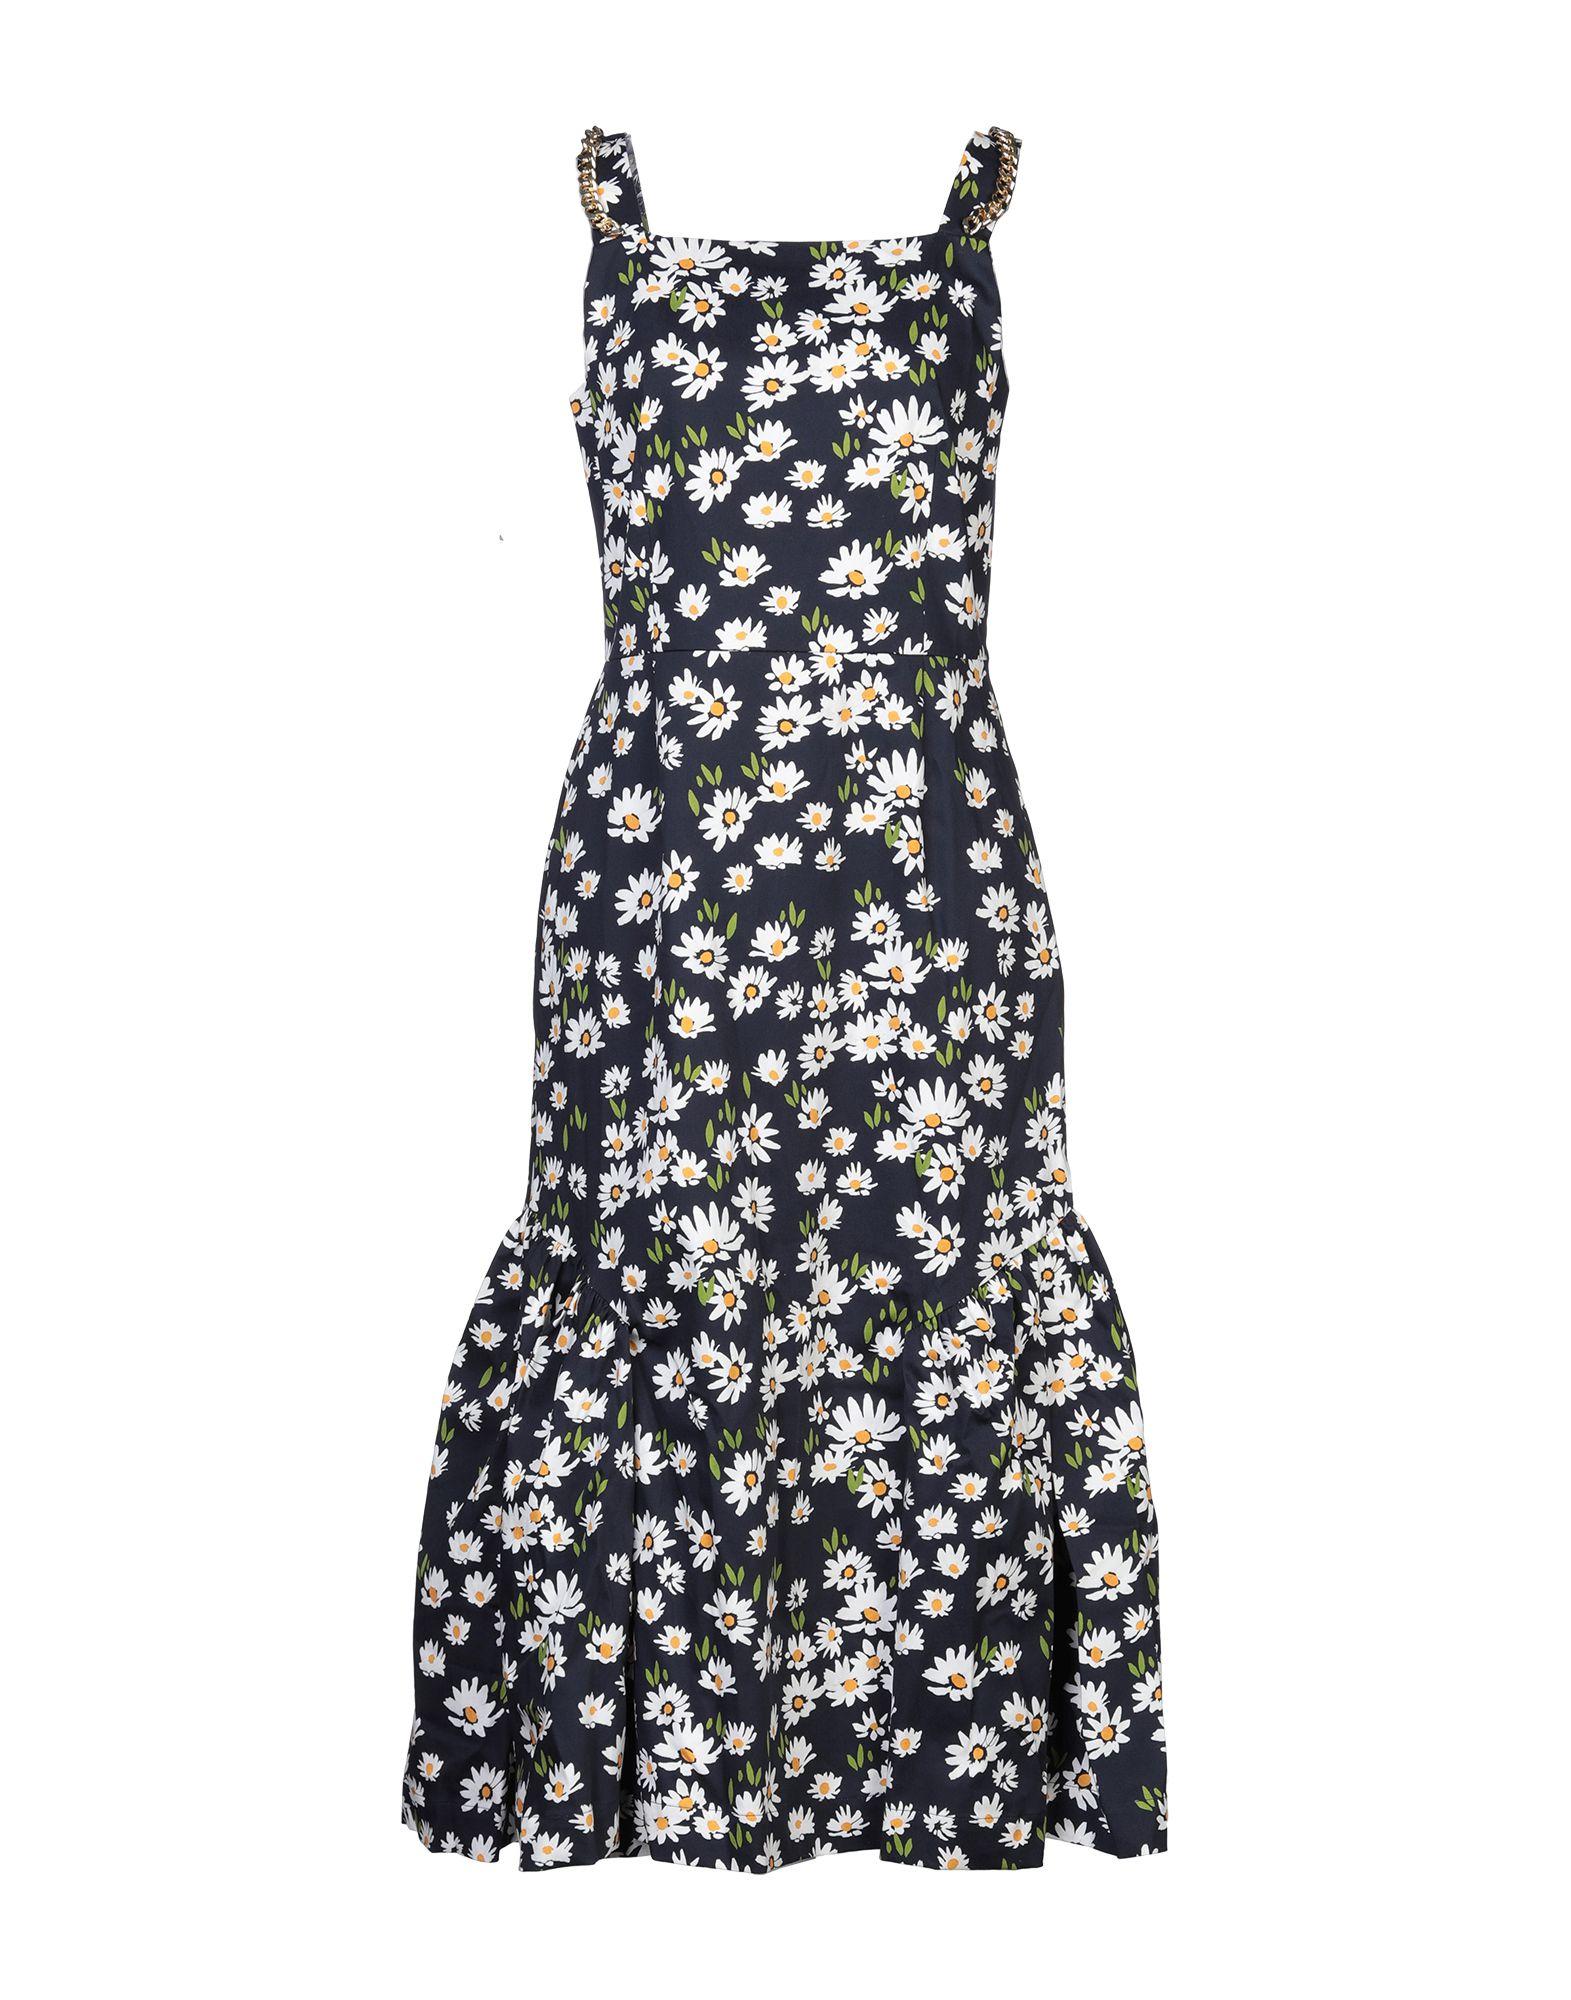 MOTHER OF PEARL Платье длиной 3/4 casio часы casio lrw 200h 7e2 коллекция analog